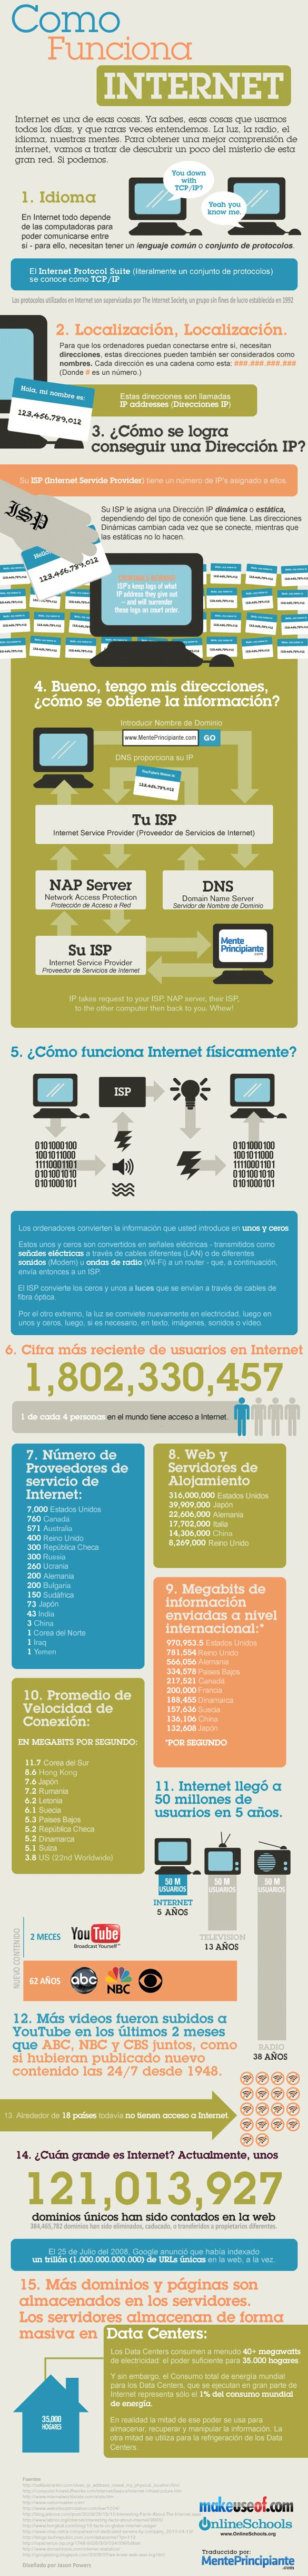 ¿Cómo Funciona #Internet? INFOGRAFIA